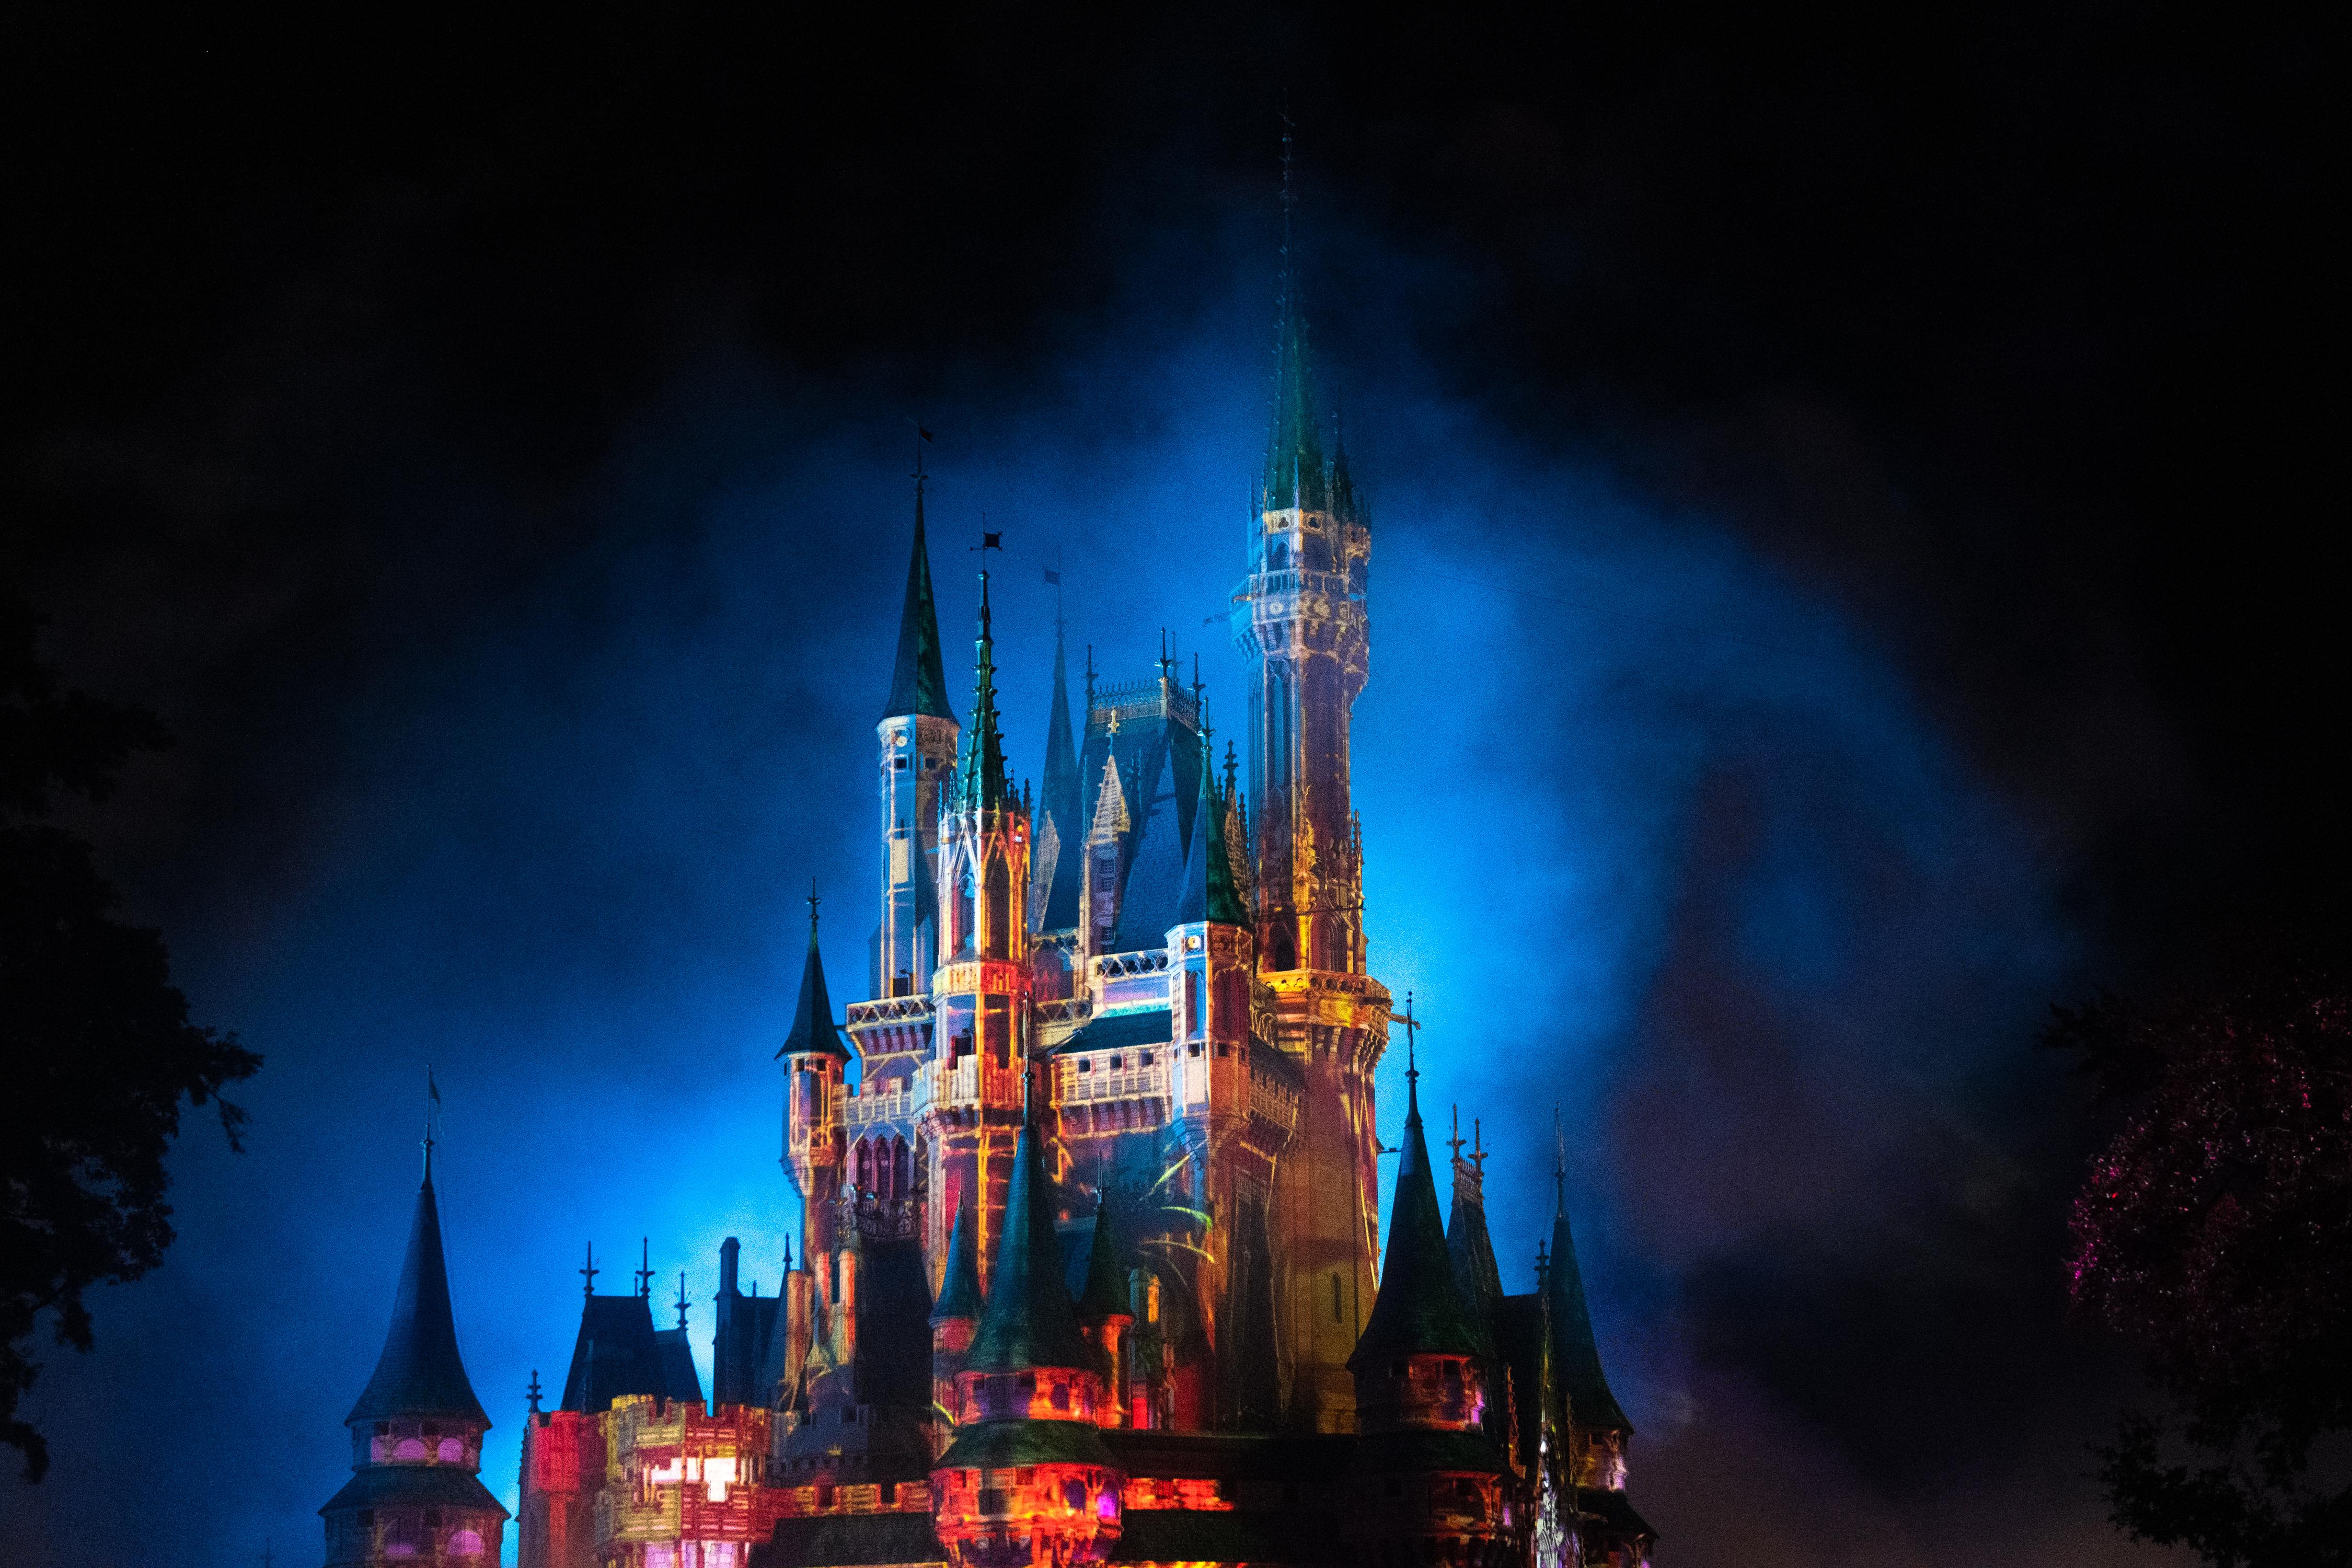 Strobe lights illuminating the Cinderella Castle at Walt Disney's Magic Kingdom at night.